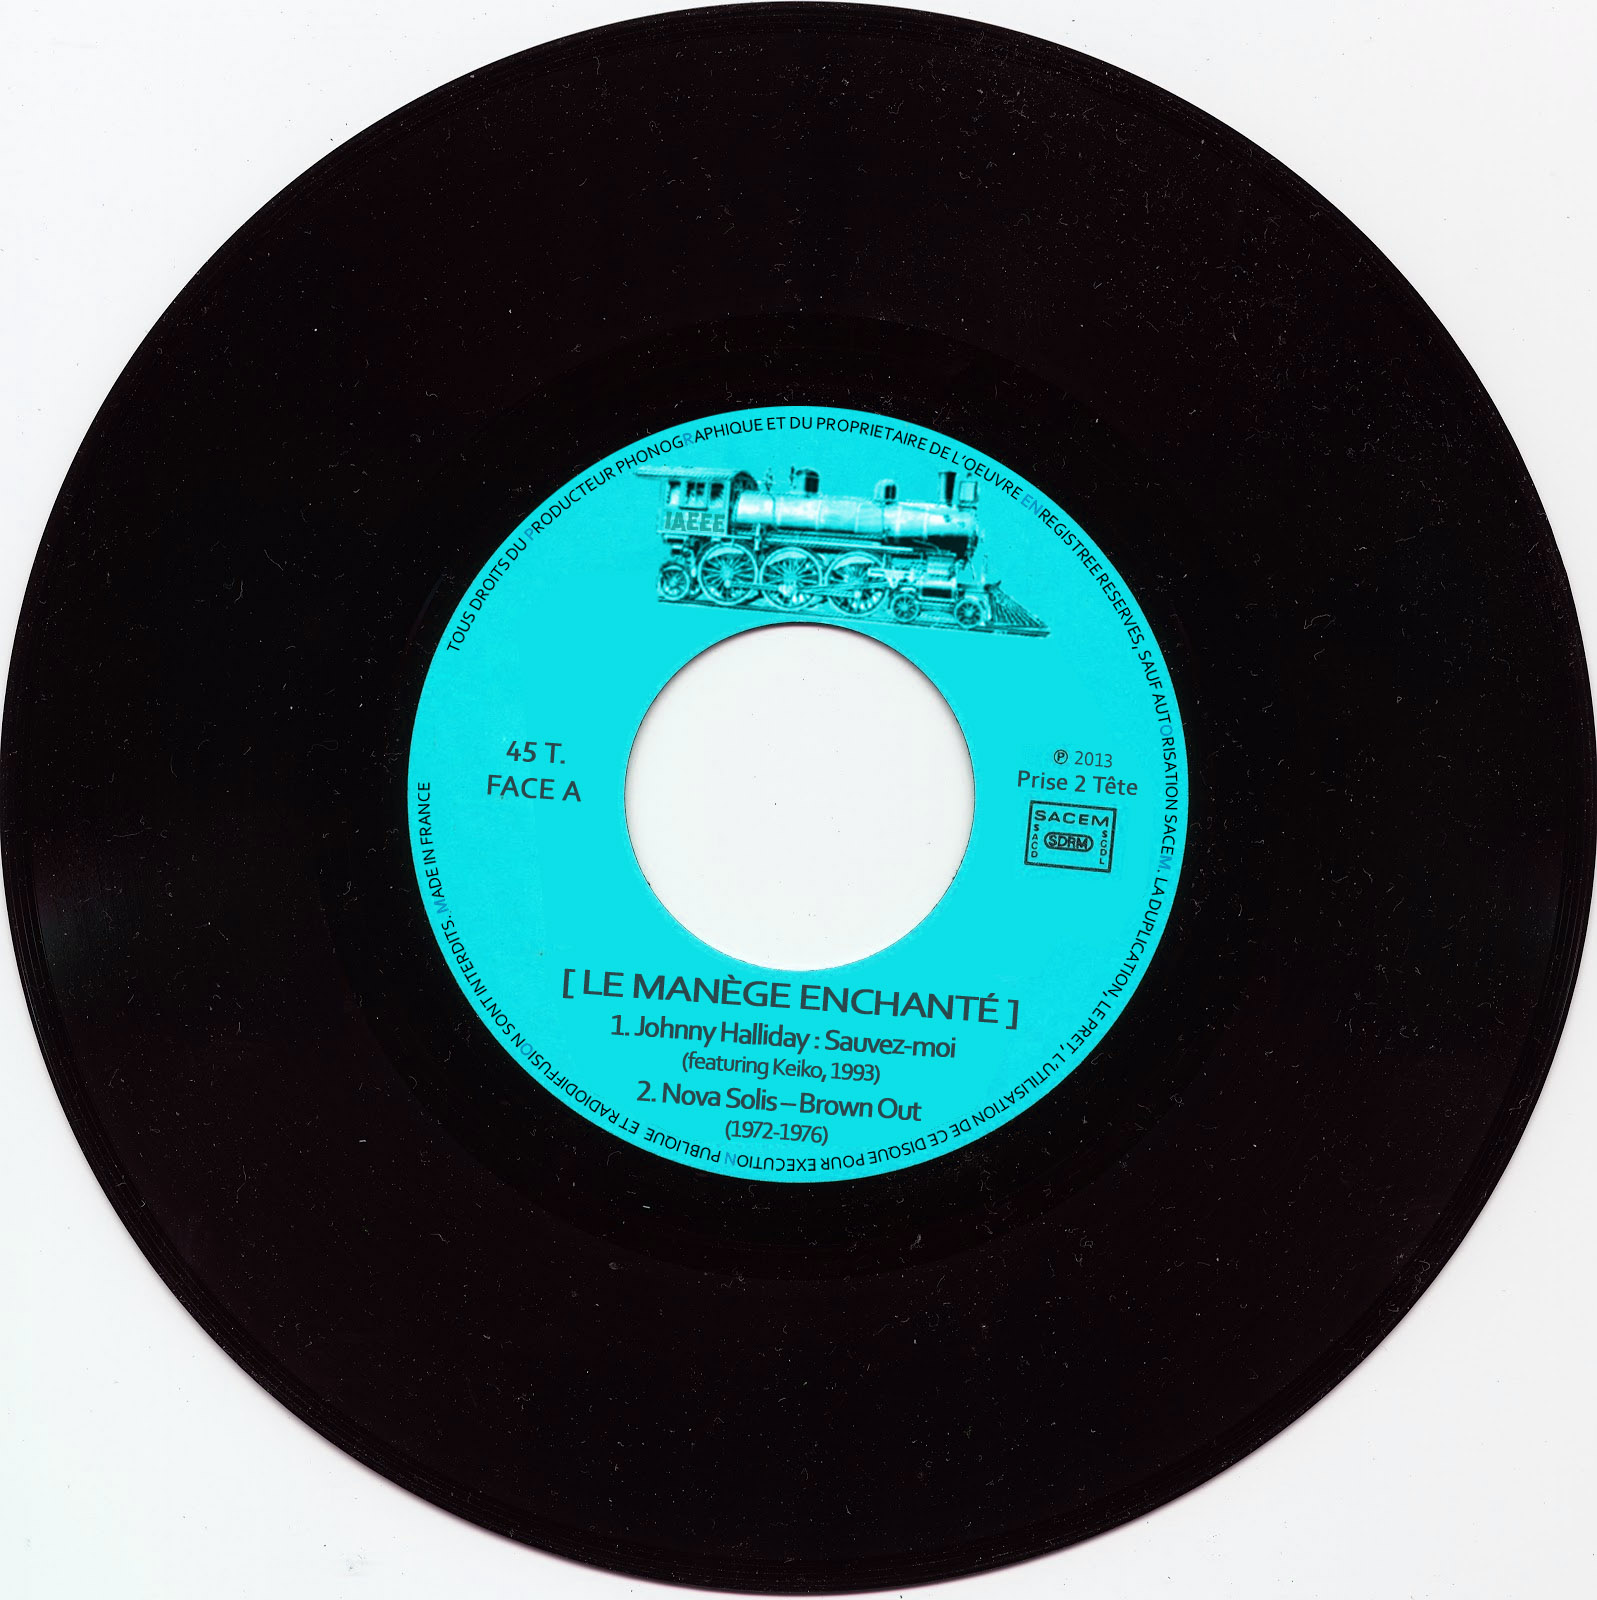 http://www.prise2tete.fr/upload/Klimrod-39-facea.jpg